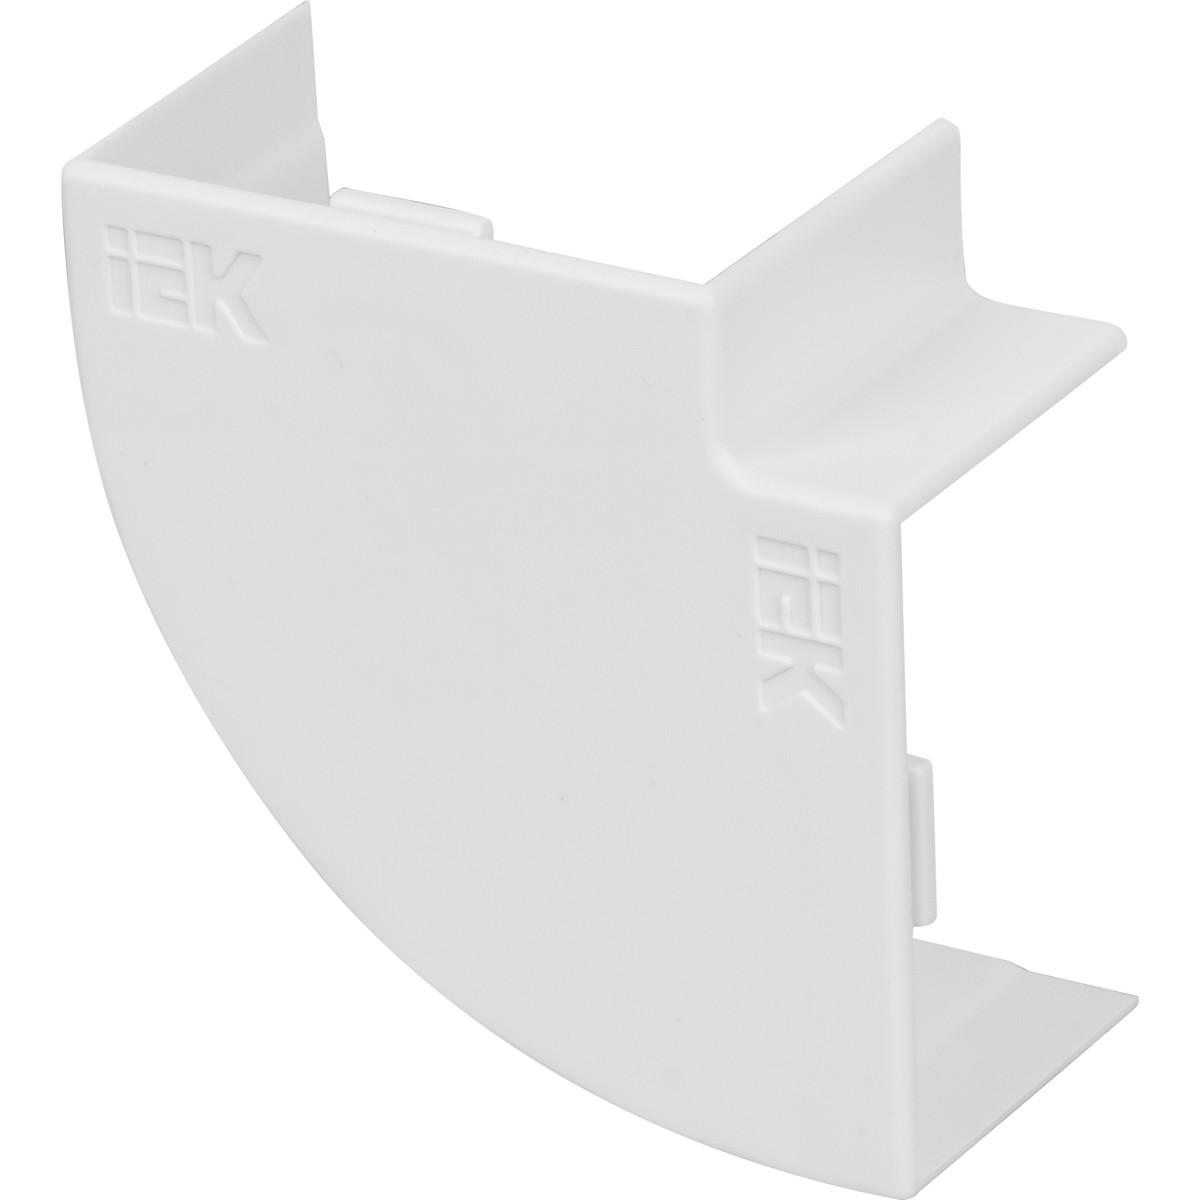 Угол 90 градусов IEK КМП 40/25 мм цвет белый 4 шт.